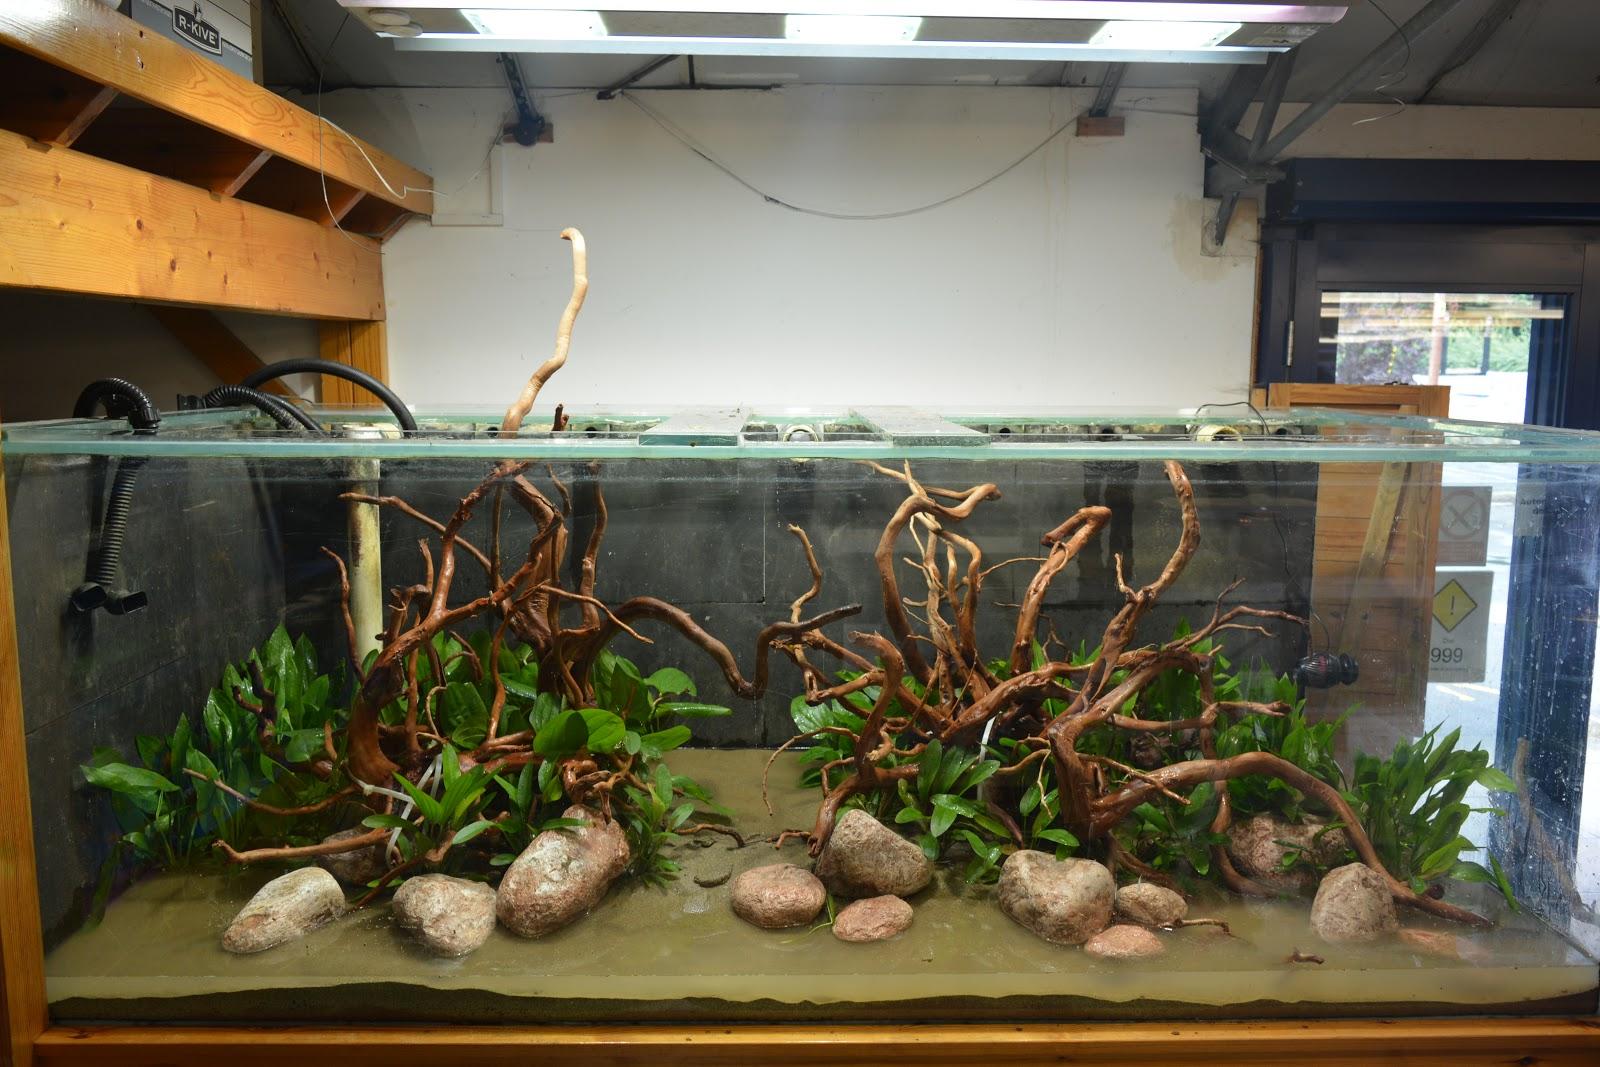 George Farmer aquascaping a 1800 litre aquarium